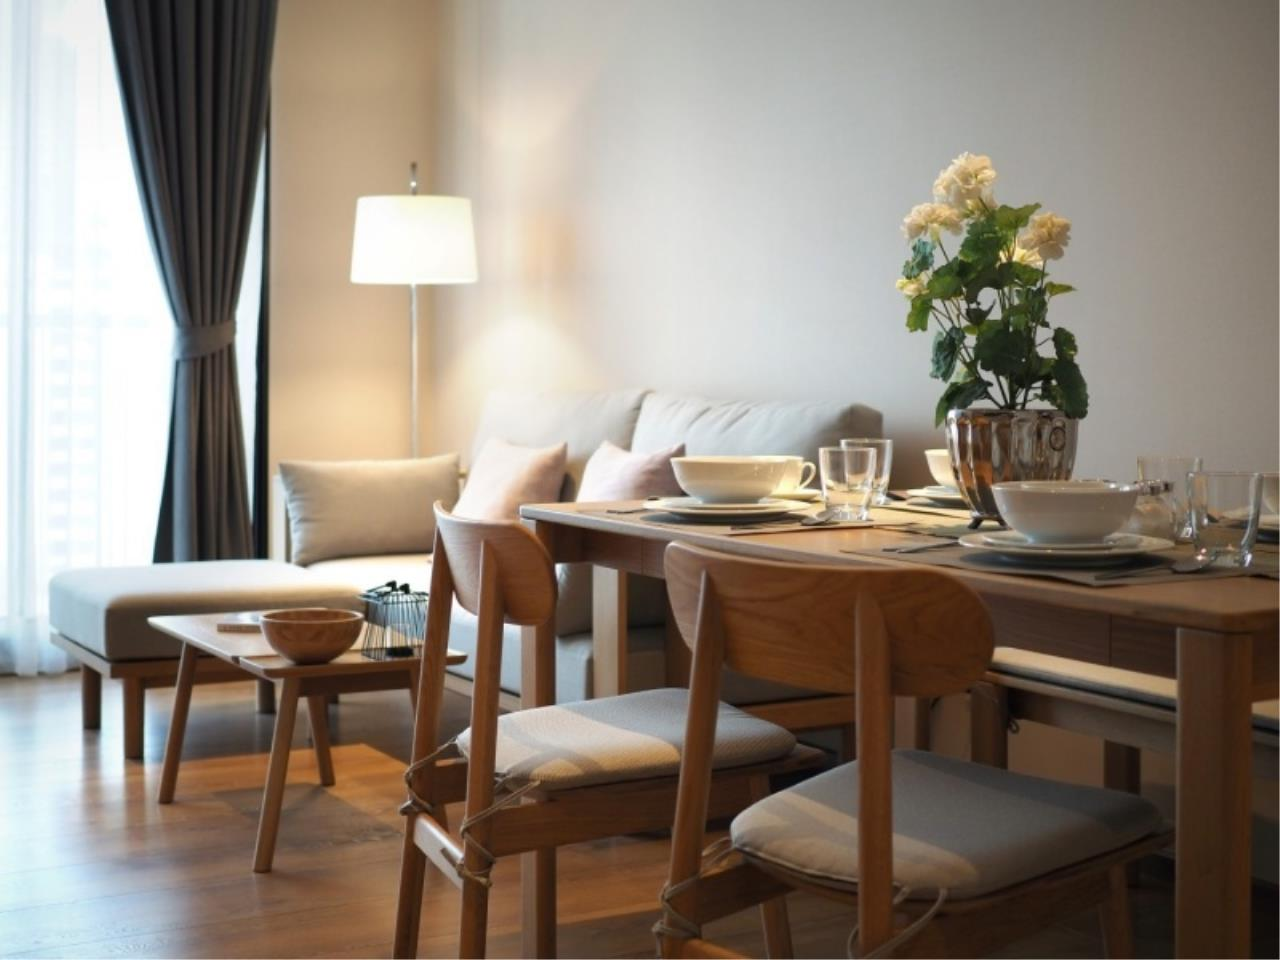 Century21 Skylux Agency's Park 24 / Condo For Rent / 2 Bedroom / 53.53 SQM / BTS Phrom Phong / Bangkok 1